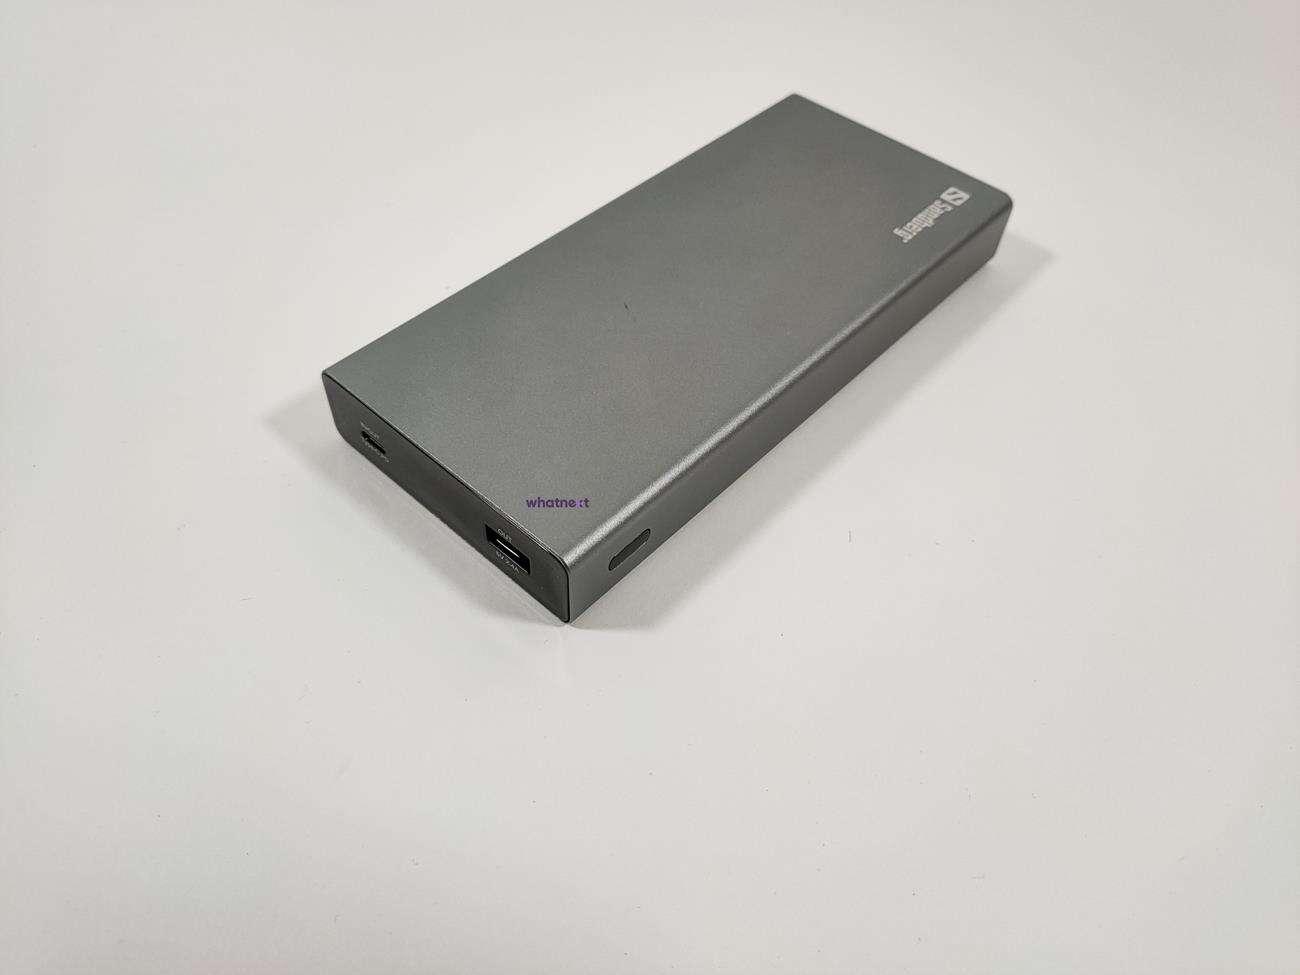 test Sandberg Powerbank USB-C PD 100W 20000 , recenzja Sandberg Powerbank USB-C PD 100W 20000 , review Sandberg Powerbank USB-C PD 100W 20000 , cena Sandberg Powerbank USB-C PD 100W 20000 , opinia Sandberg Powerbank USB-C PD 100W 20000